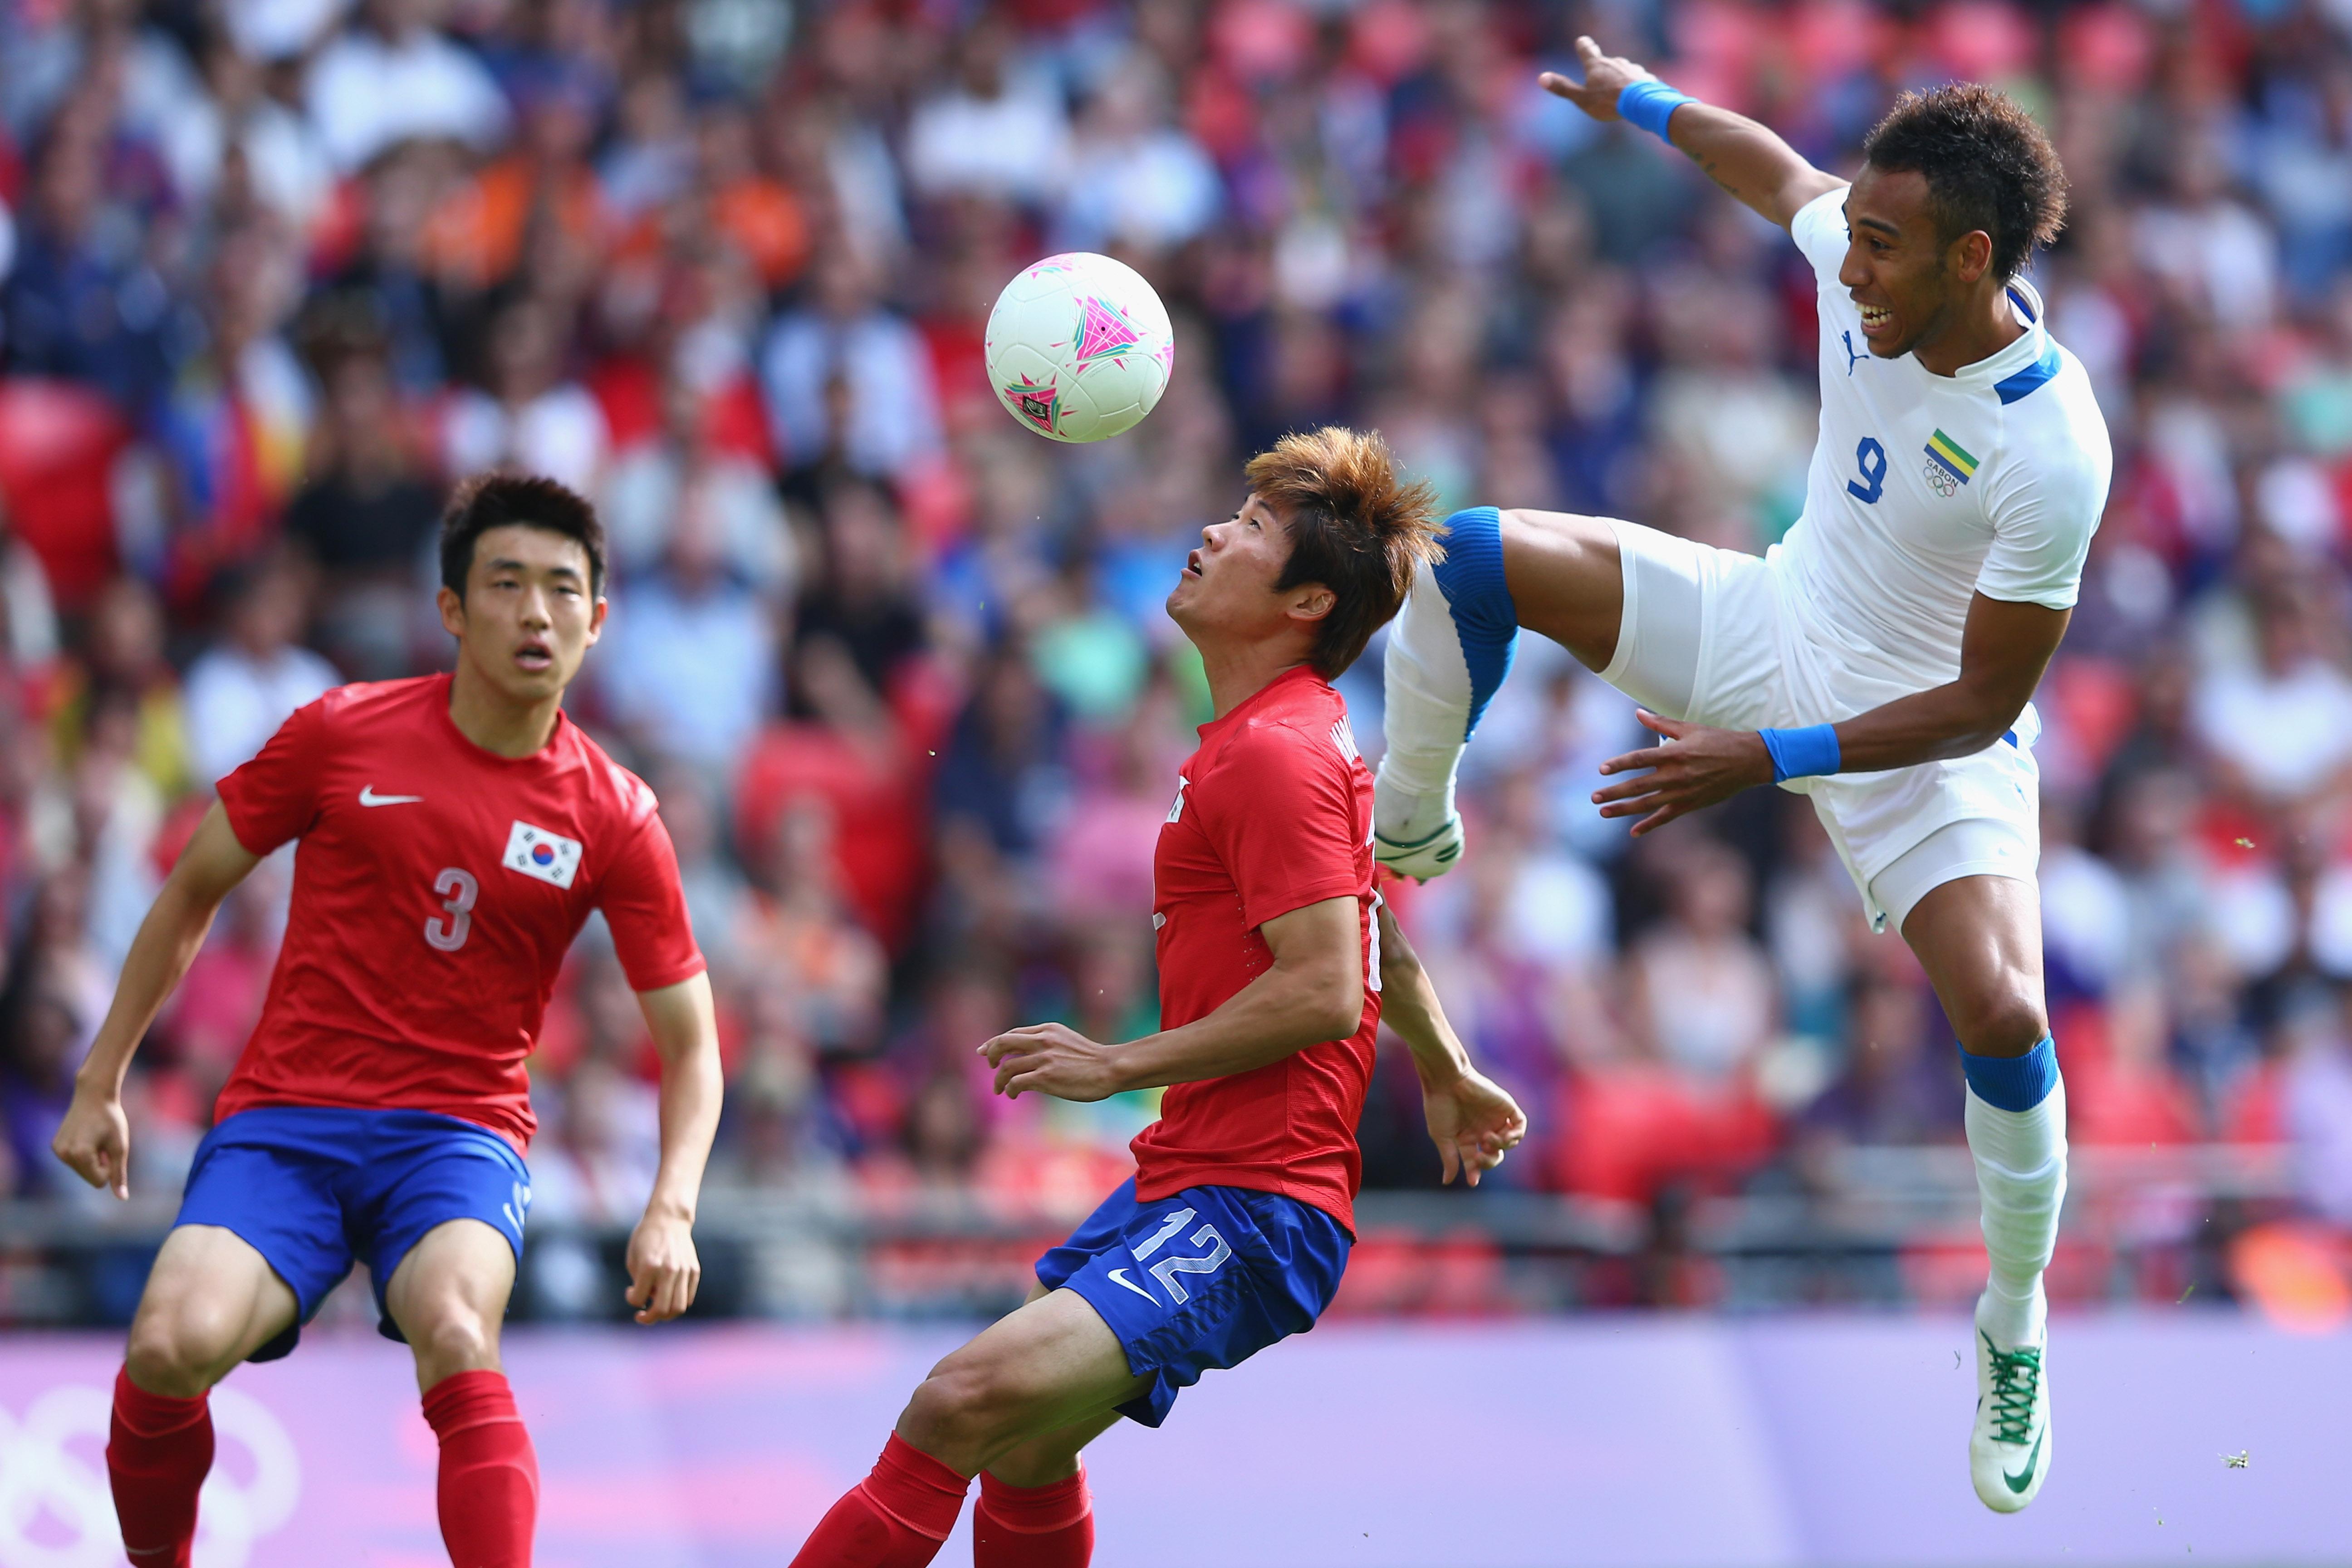 Olympics Day 5 - Men's Football - Korea Republic v Gabon